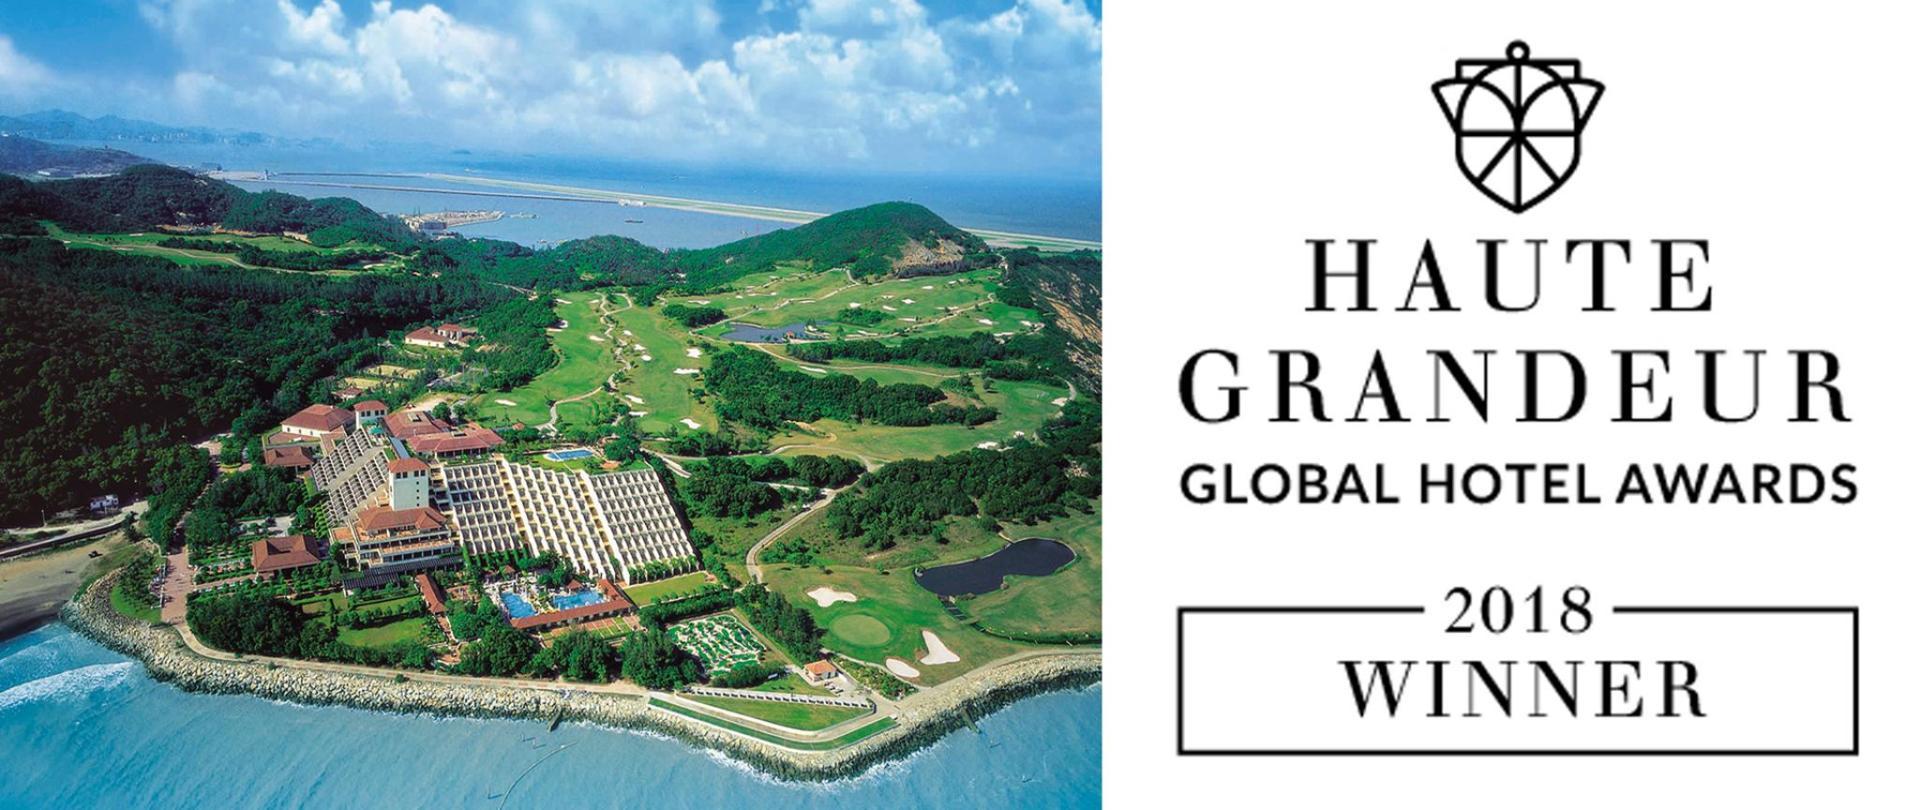 HG Award-banner_GCR copy.jpg